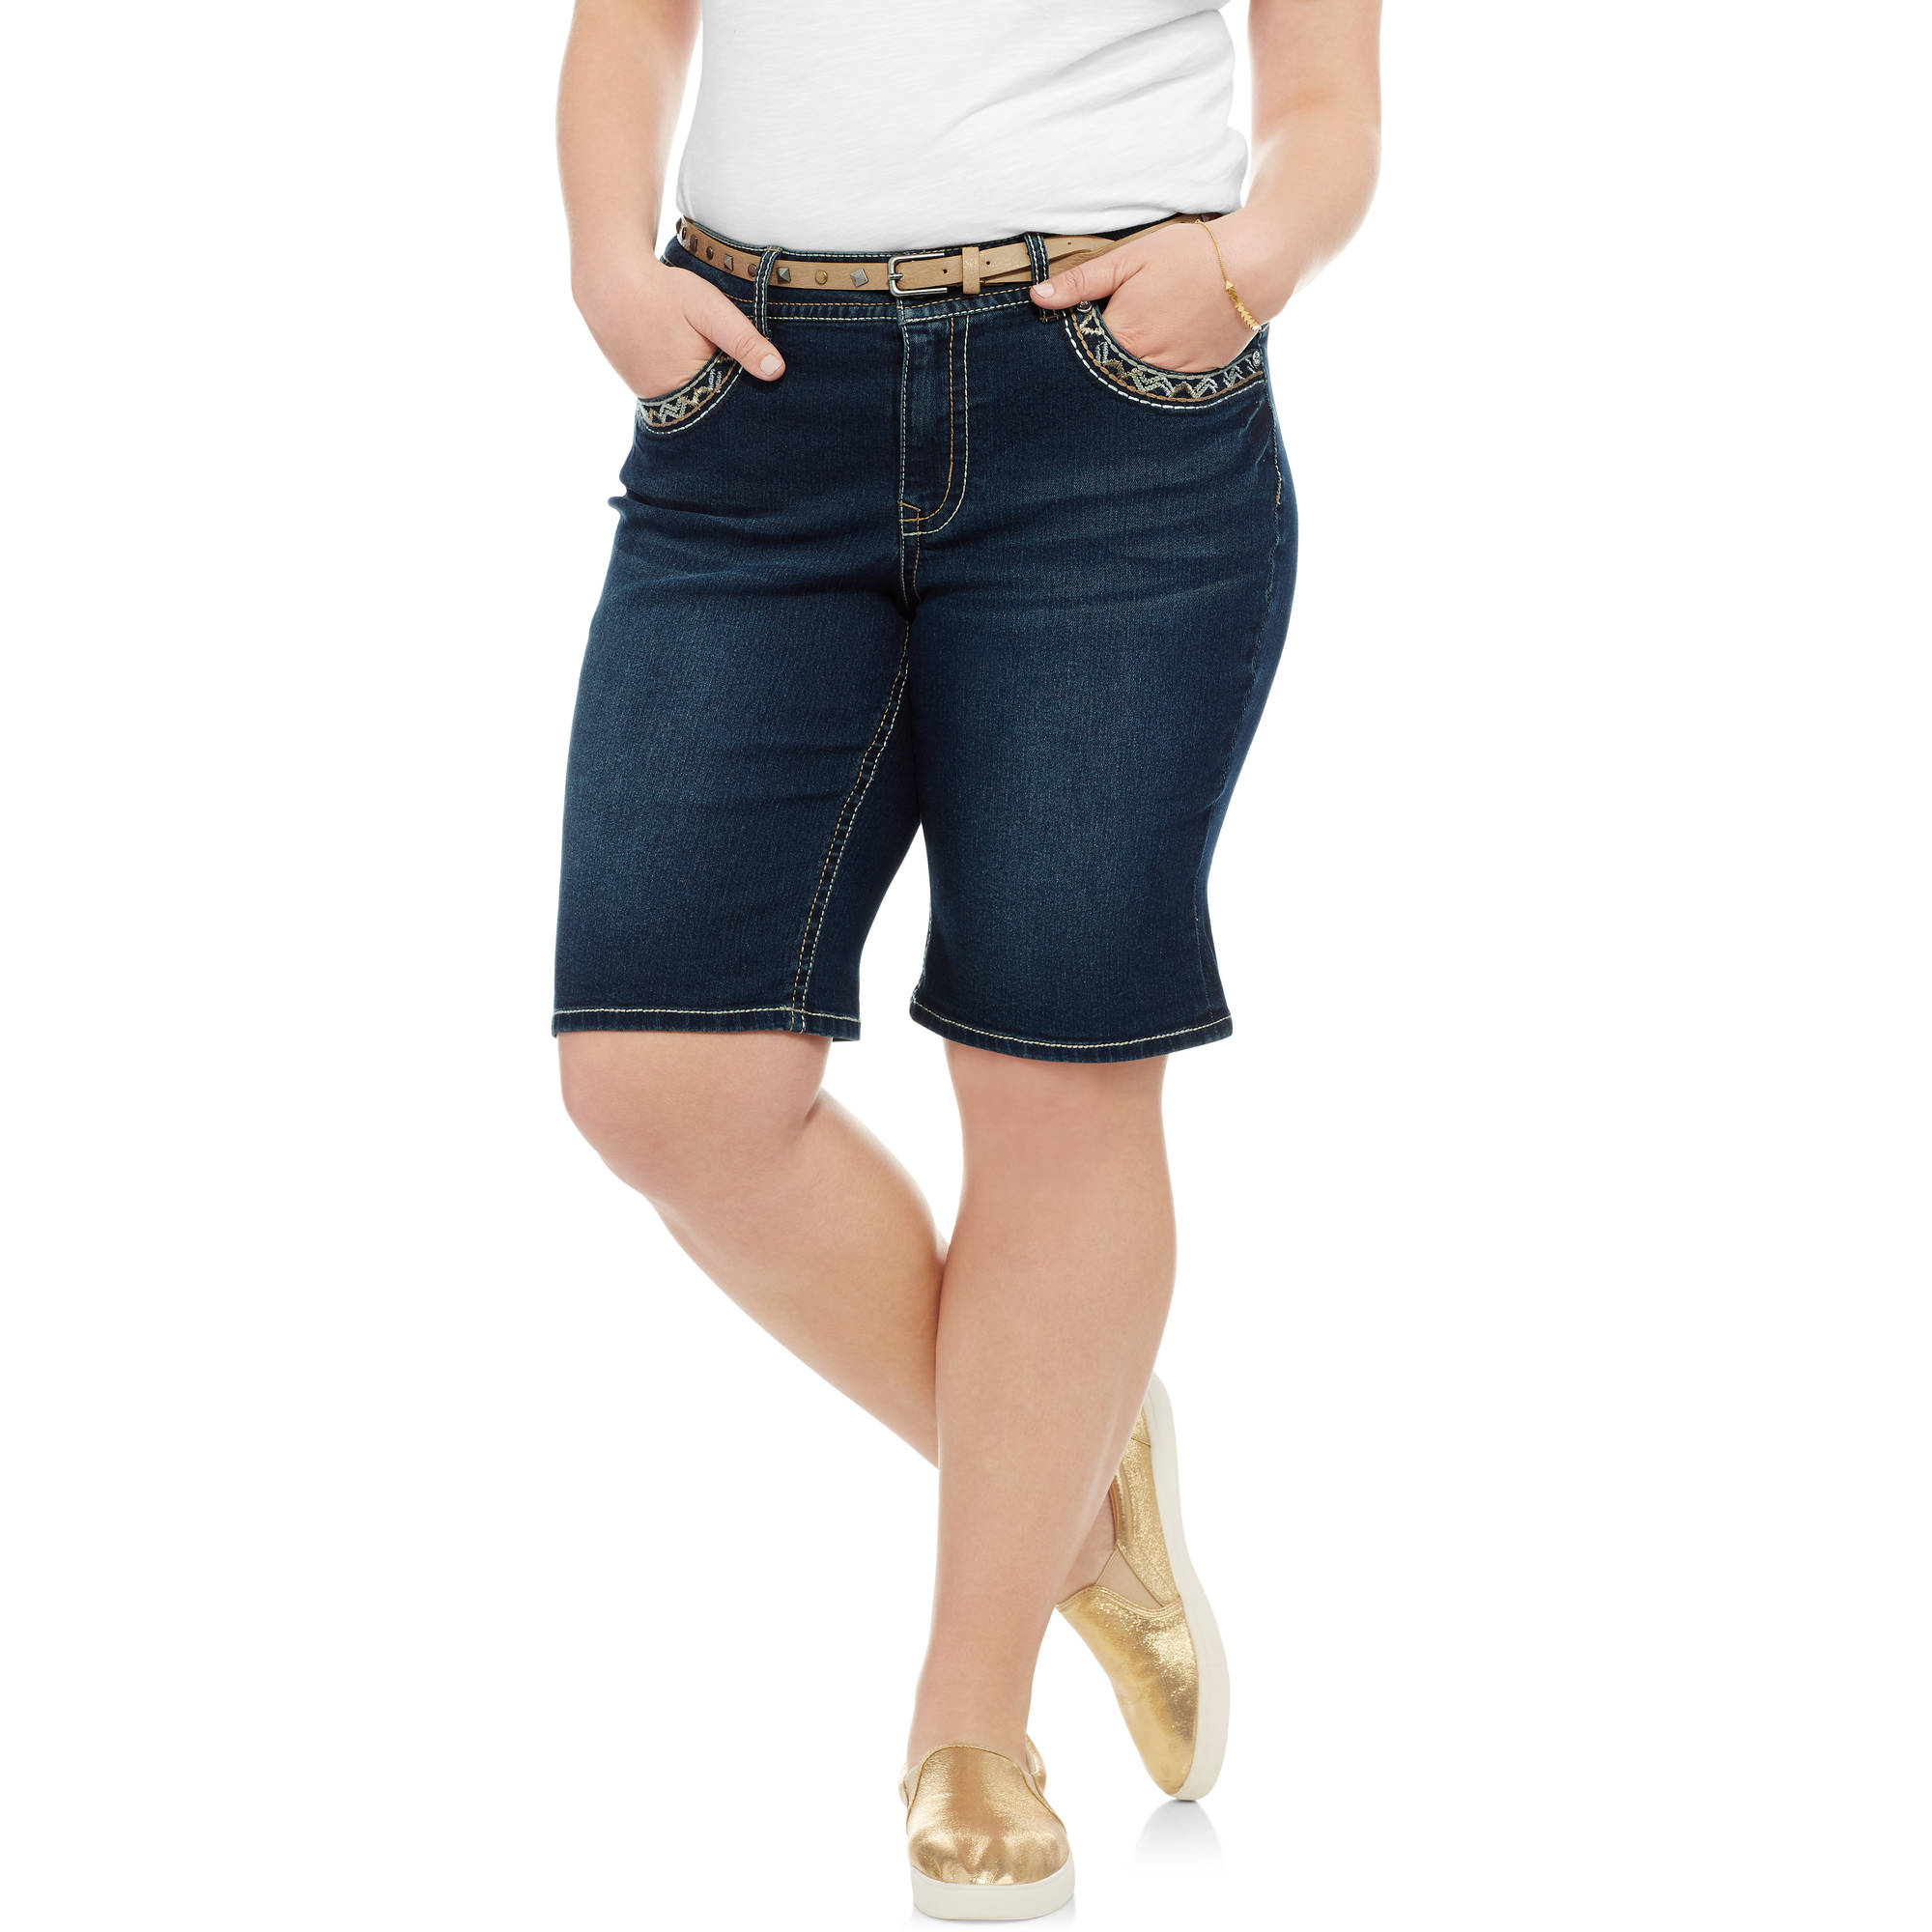 Faded Glory Women's Plus Fashion Denim Bermuda Short